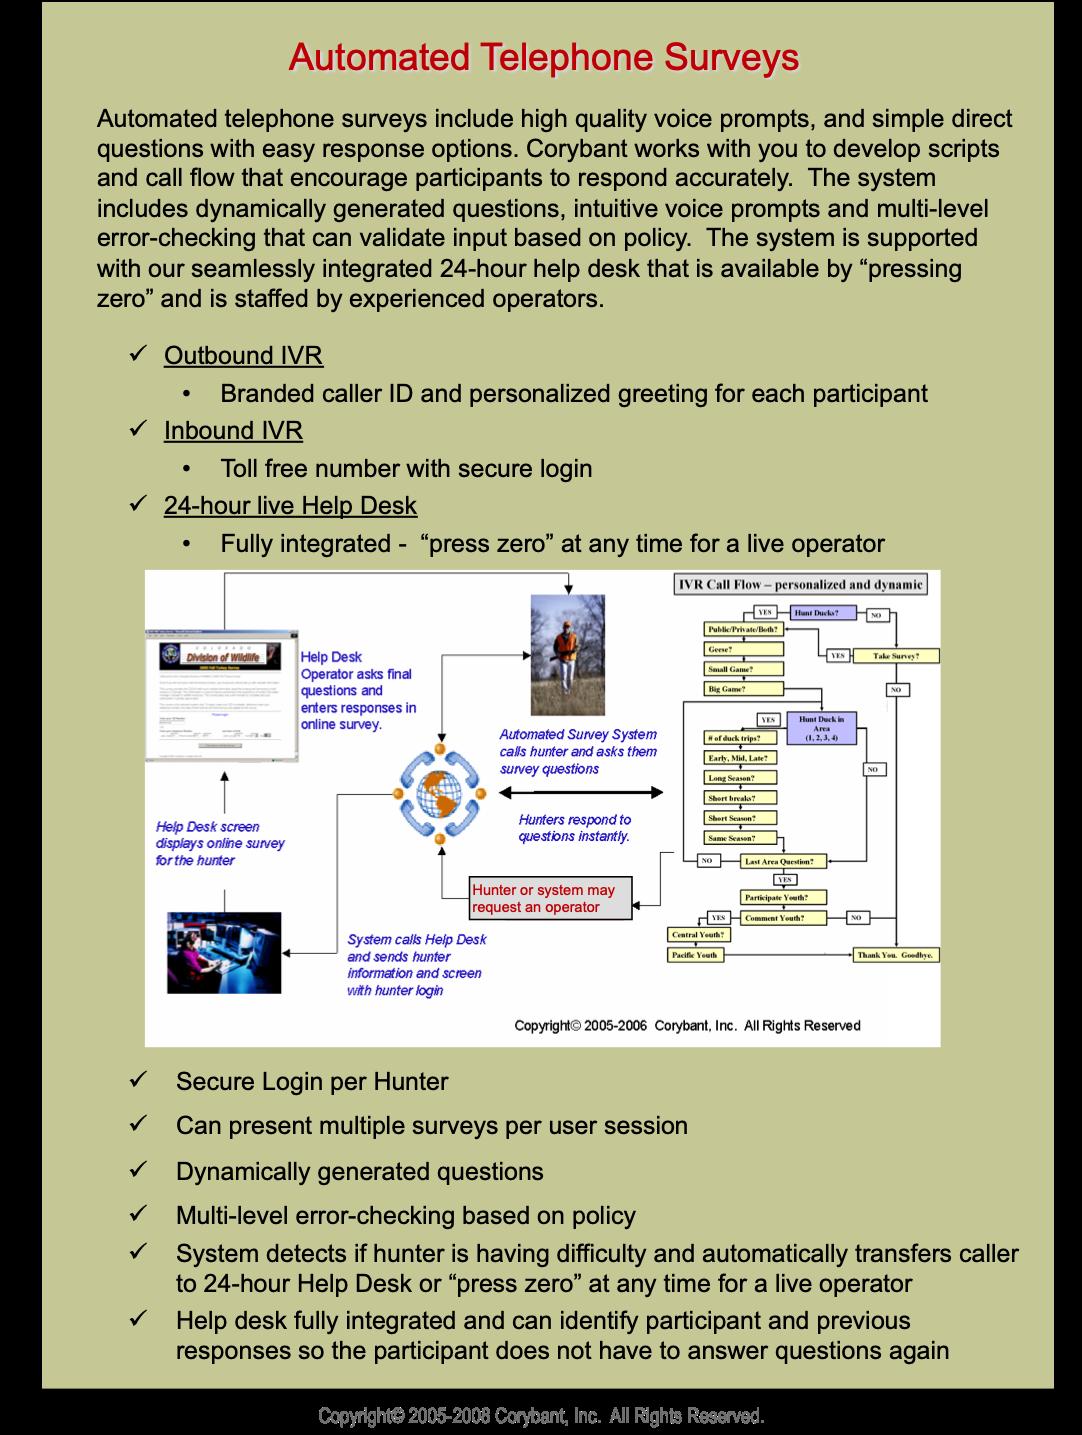 Automated Telephone Surveys.png